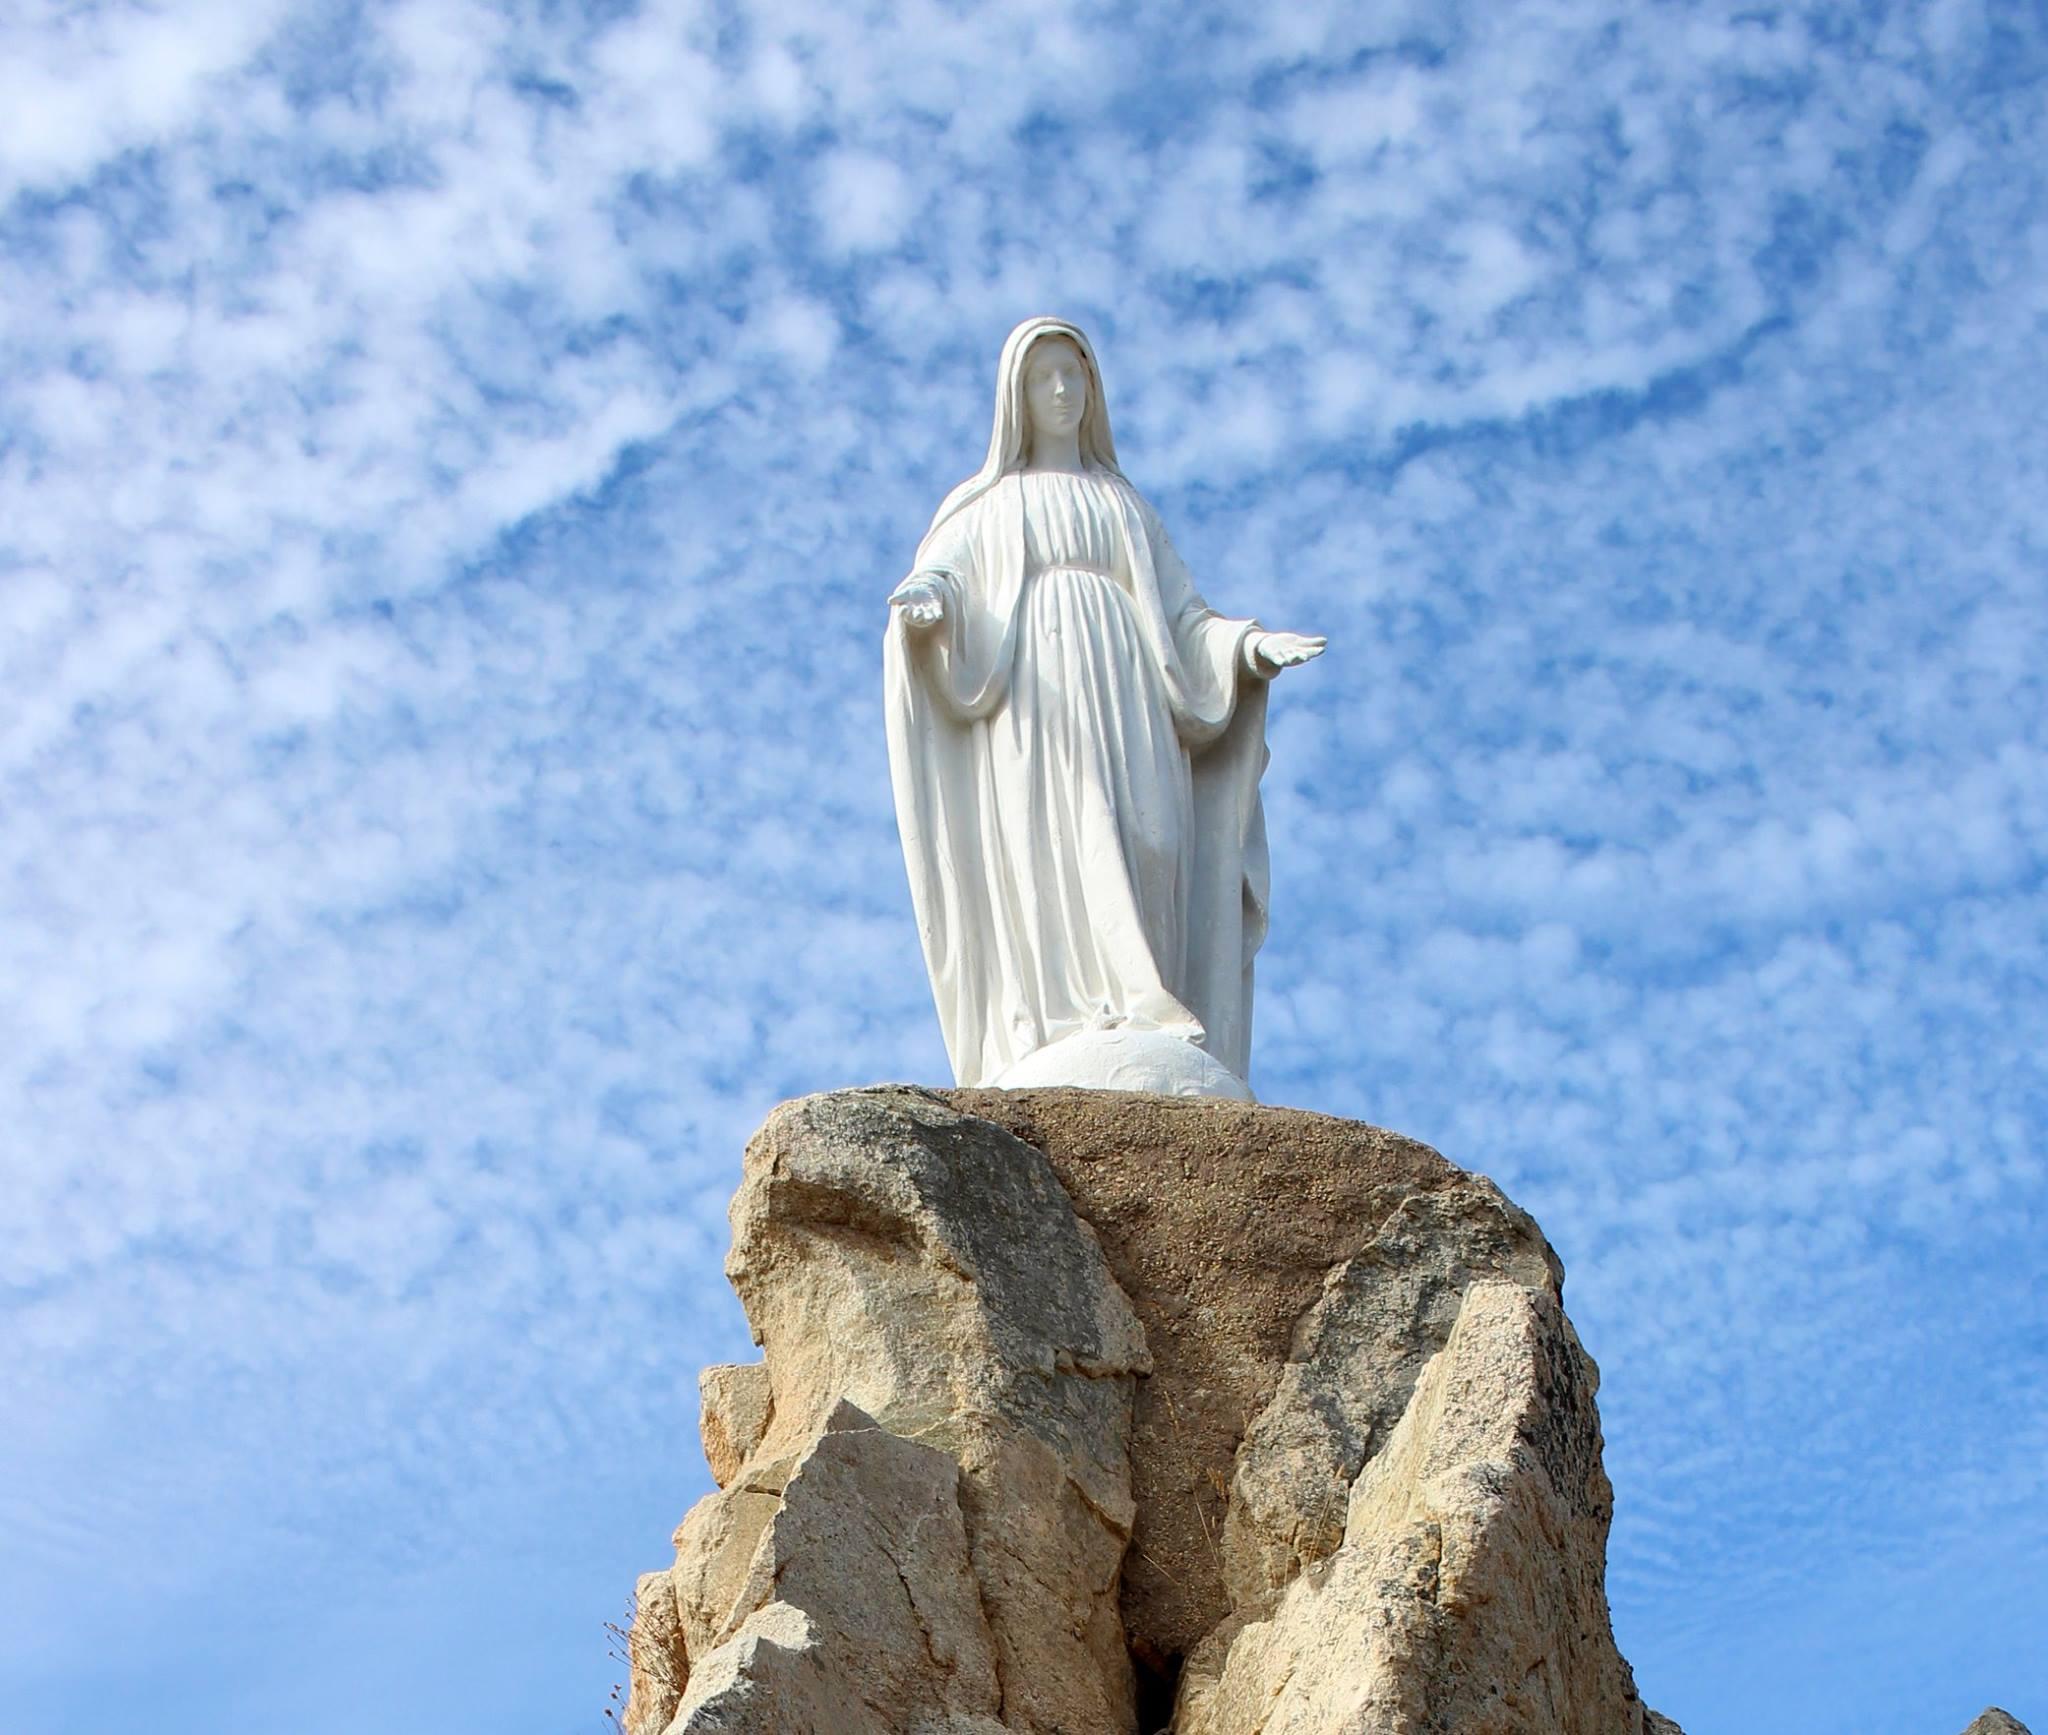 Pèlerinage de Notre-Dame de la Serra à Calvi